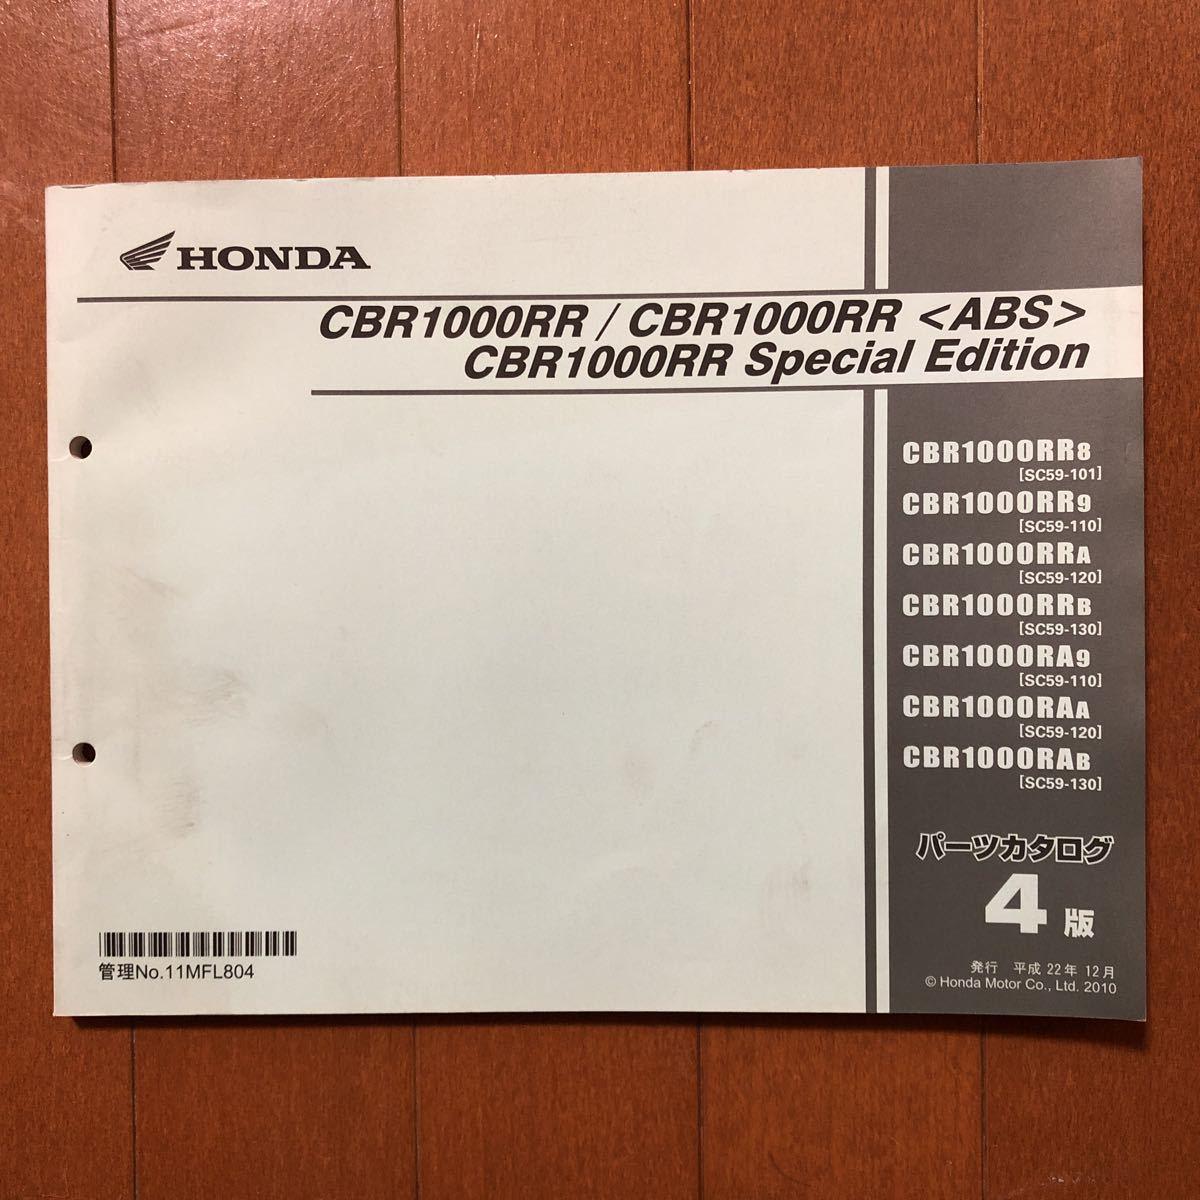 CBR1000RR SC59 パーツカタログ 即決価格で送料無料です